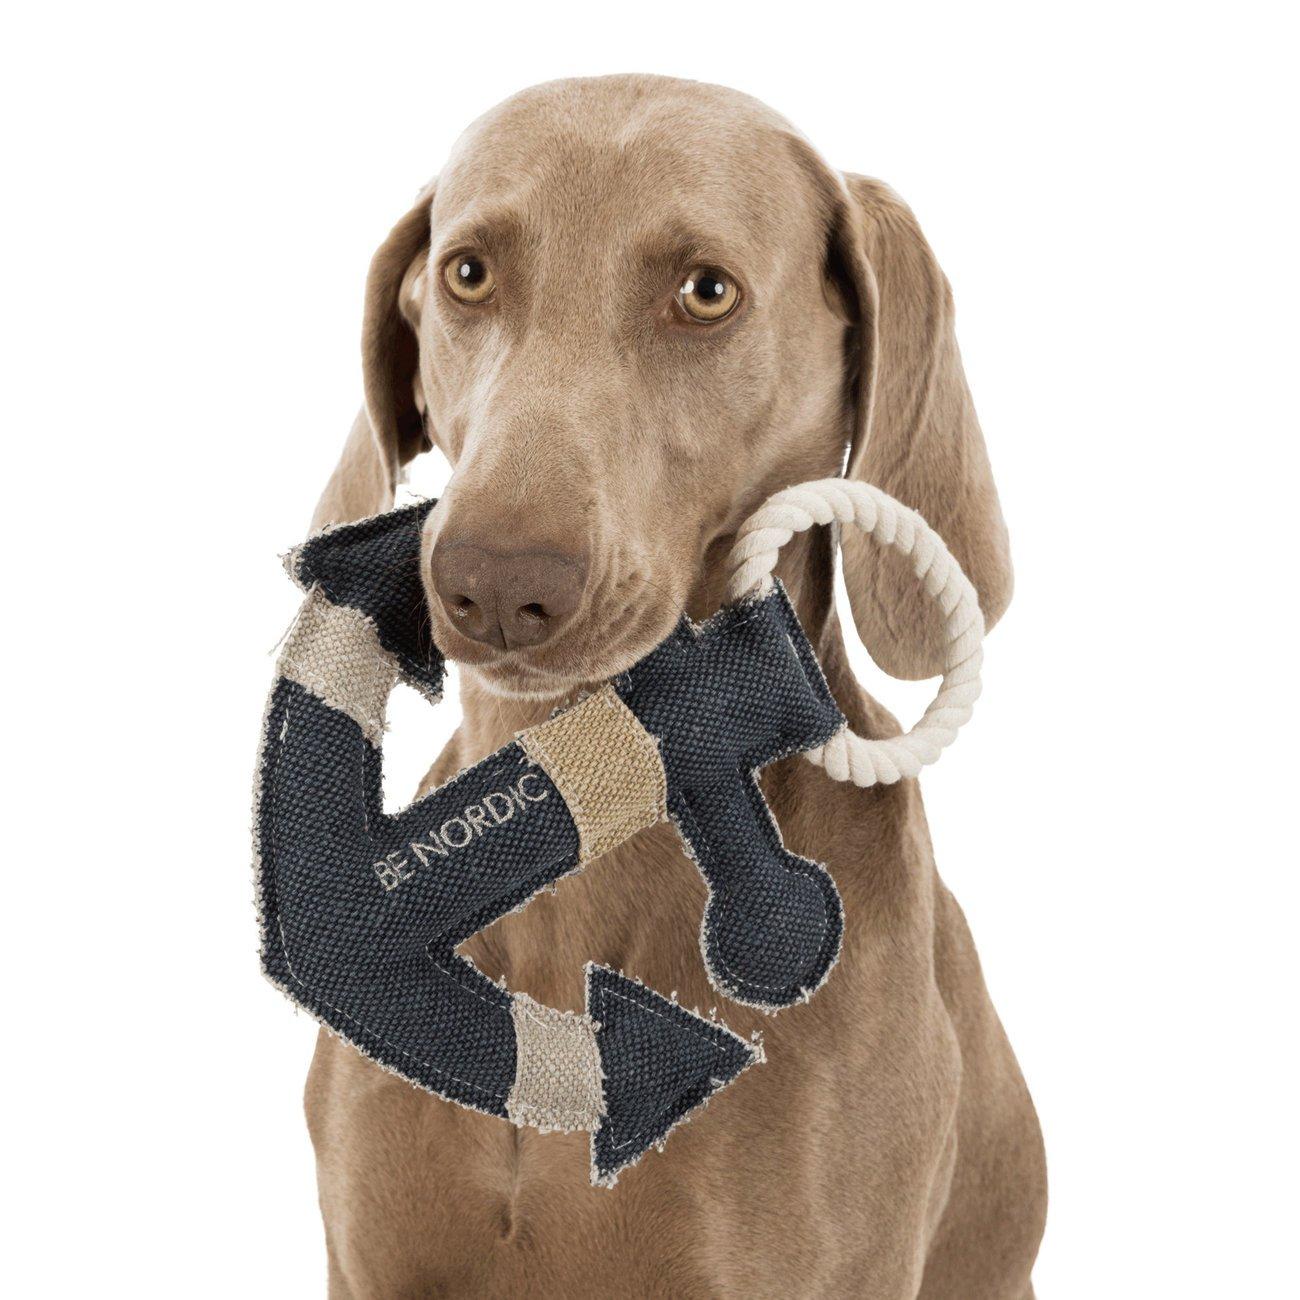 TRIXIE BE NORDIC Anker, Hundespielzeug 35651, Bild 3